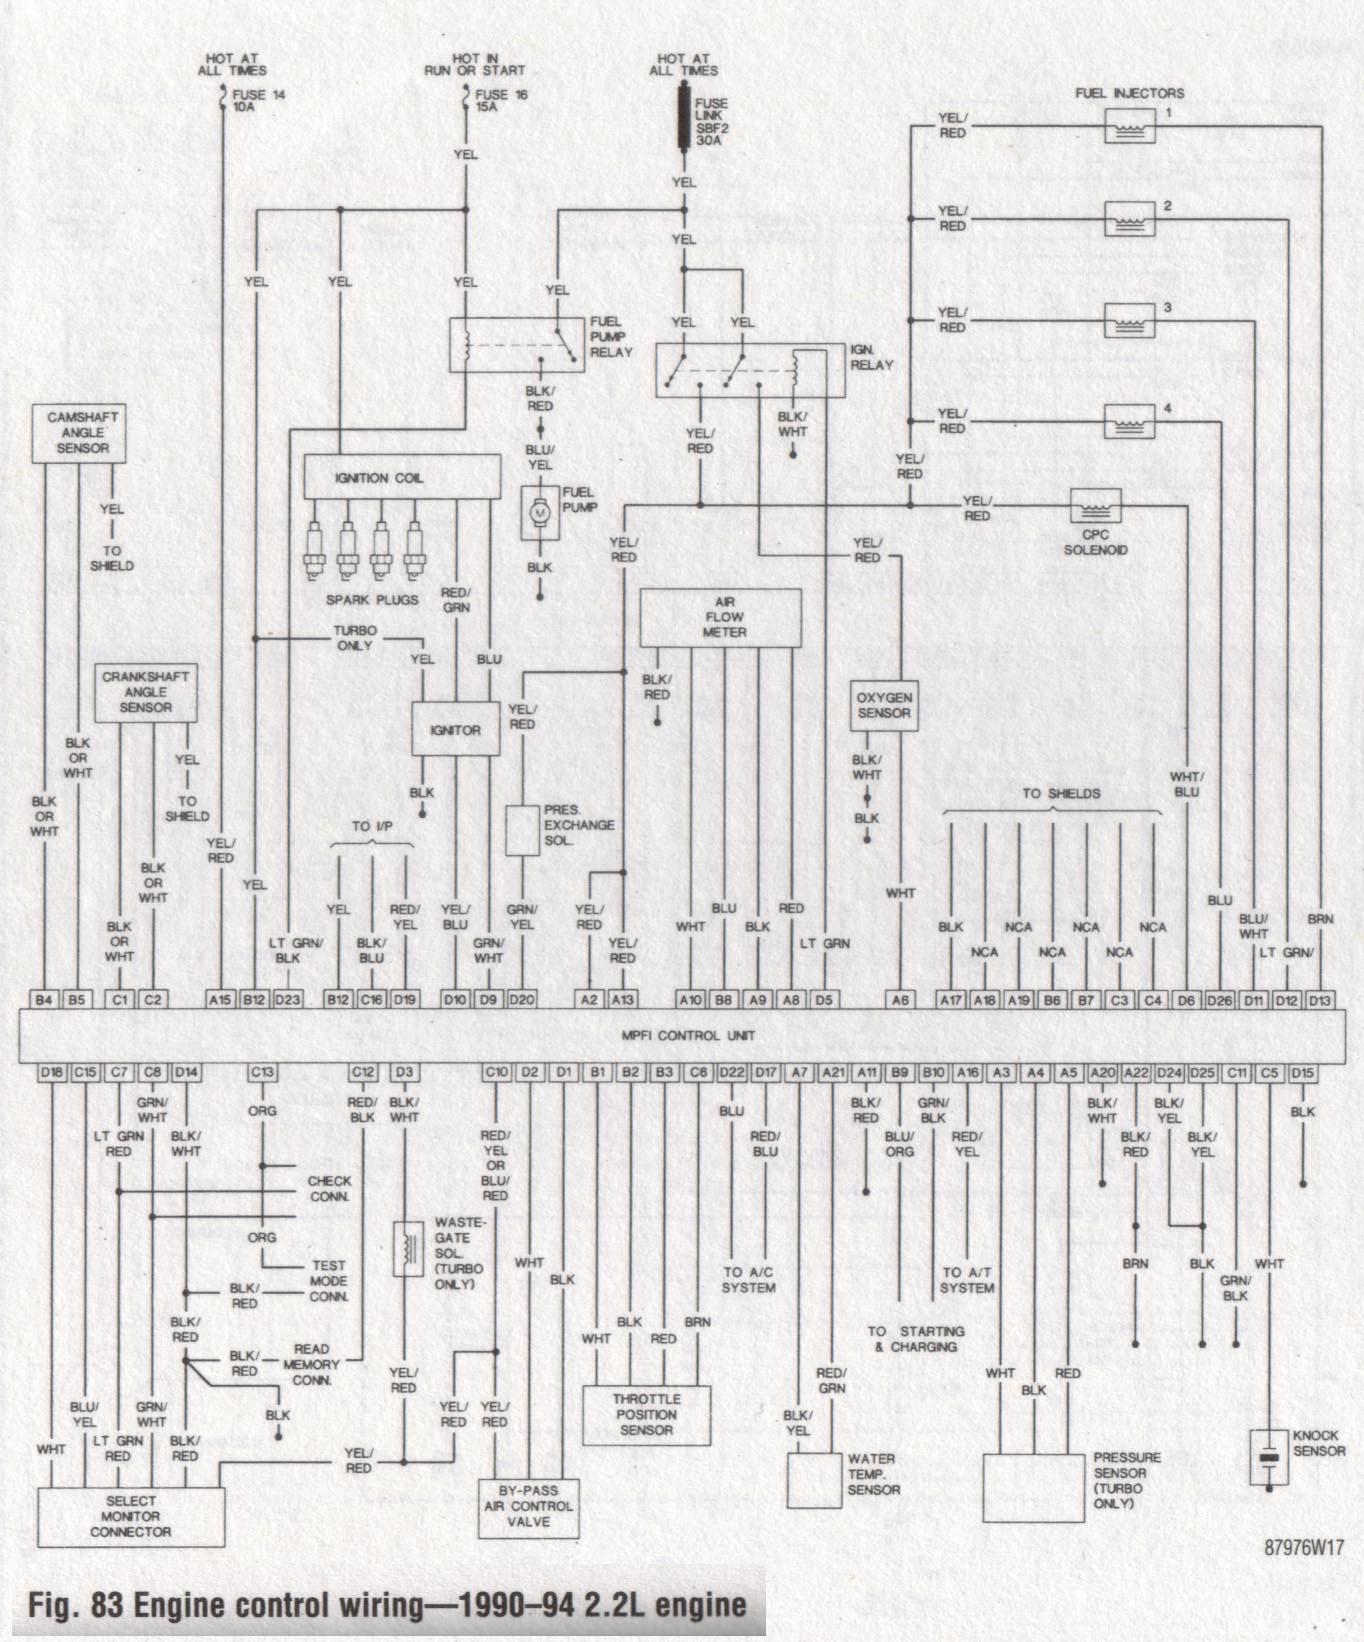 Ford 302 Alternator Wiring Diagram Http Wwwpic2flycom Ford302